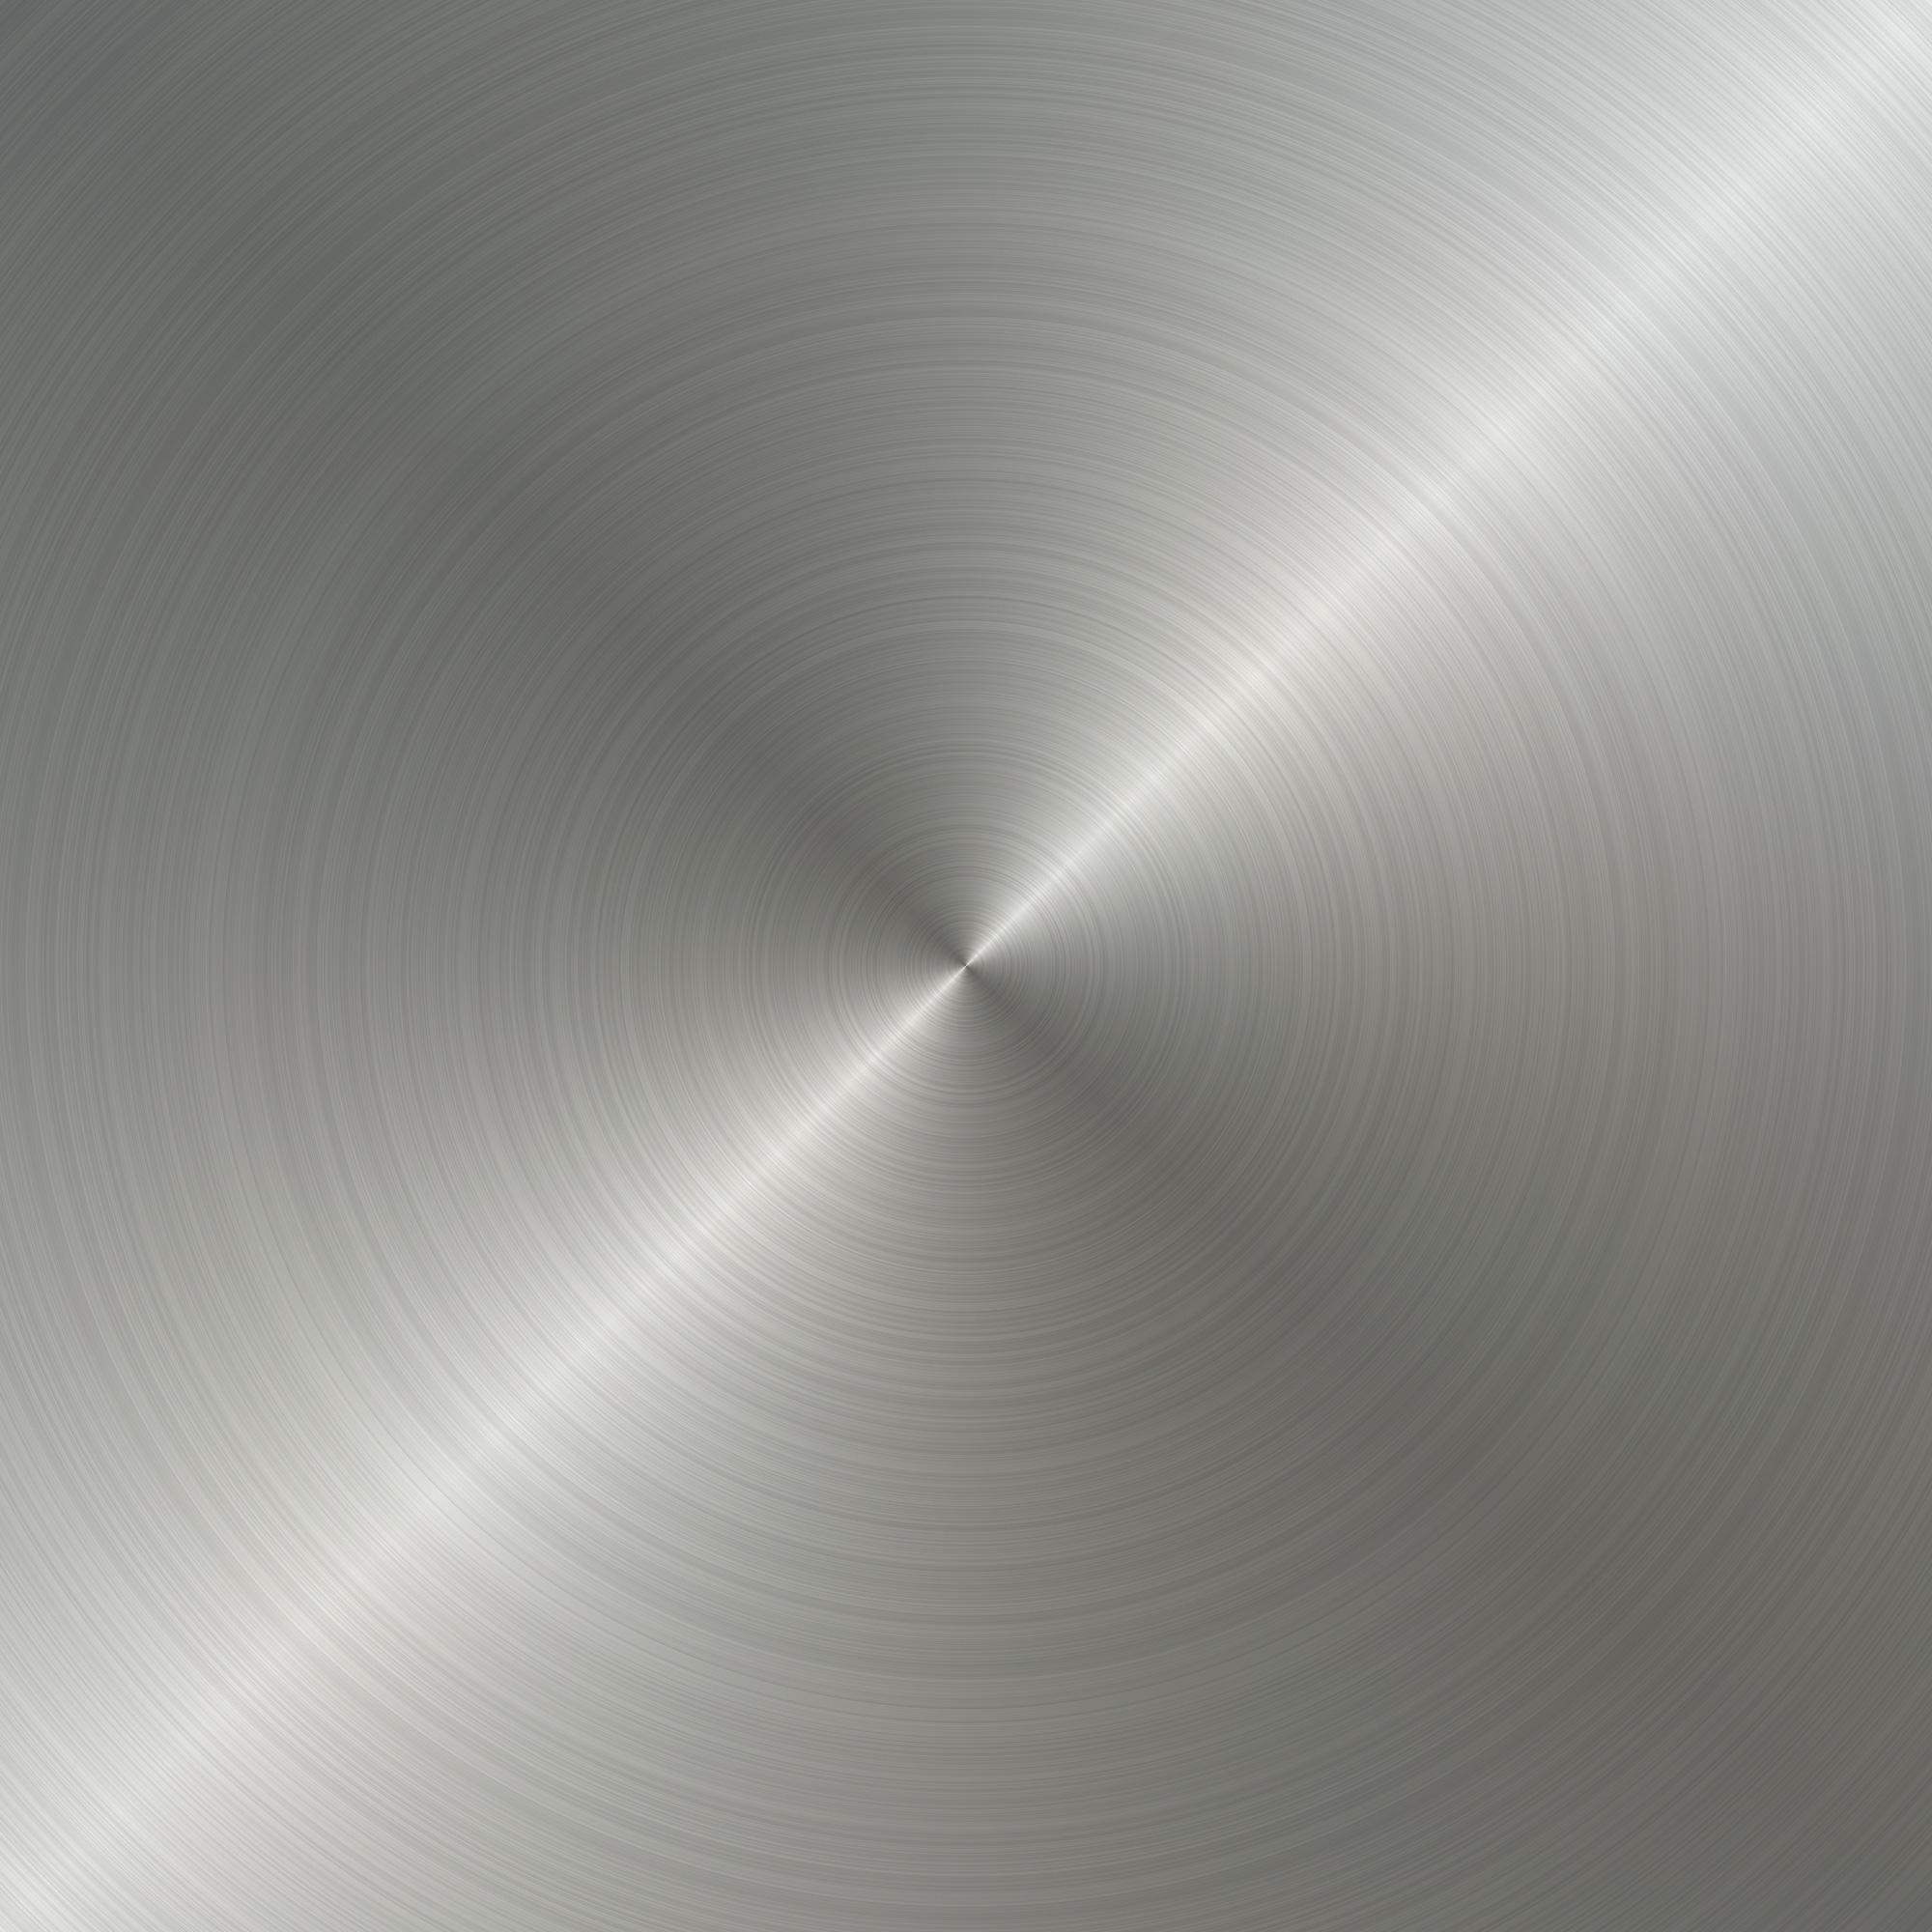 Metallic Silver Wallpaper - WallpaperSafari